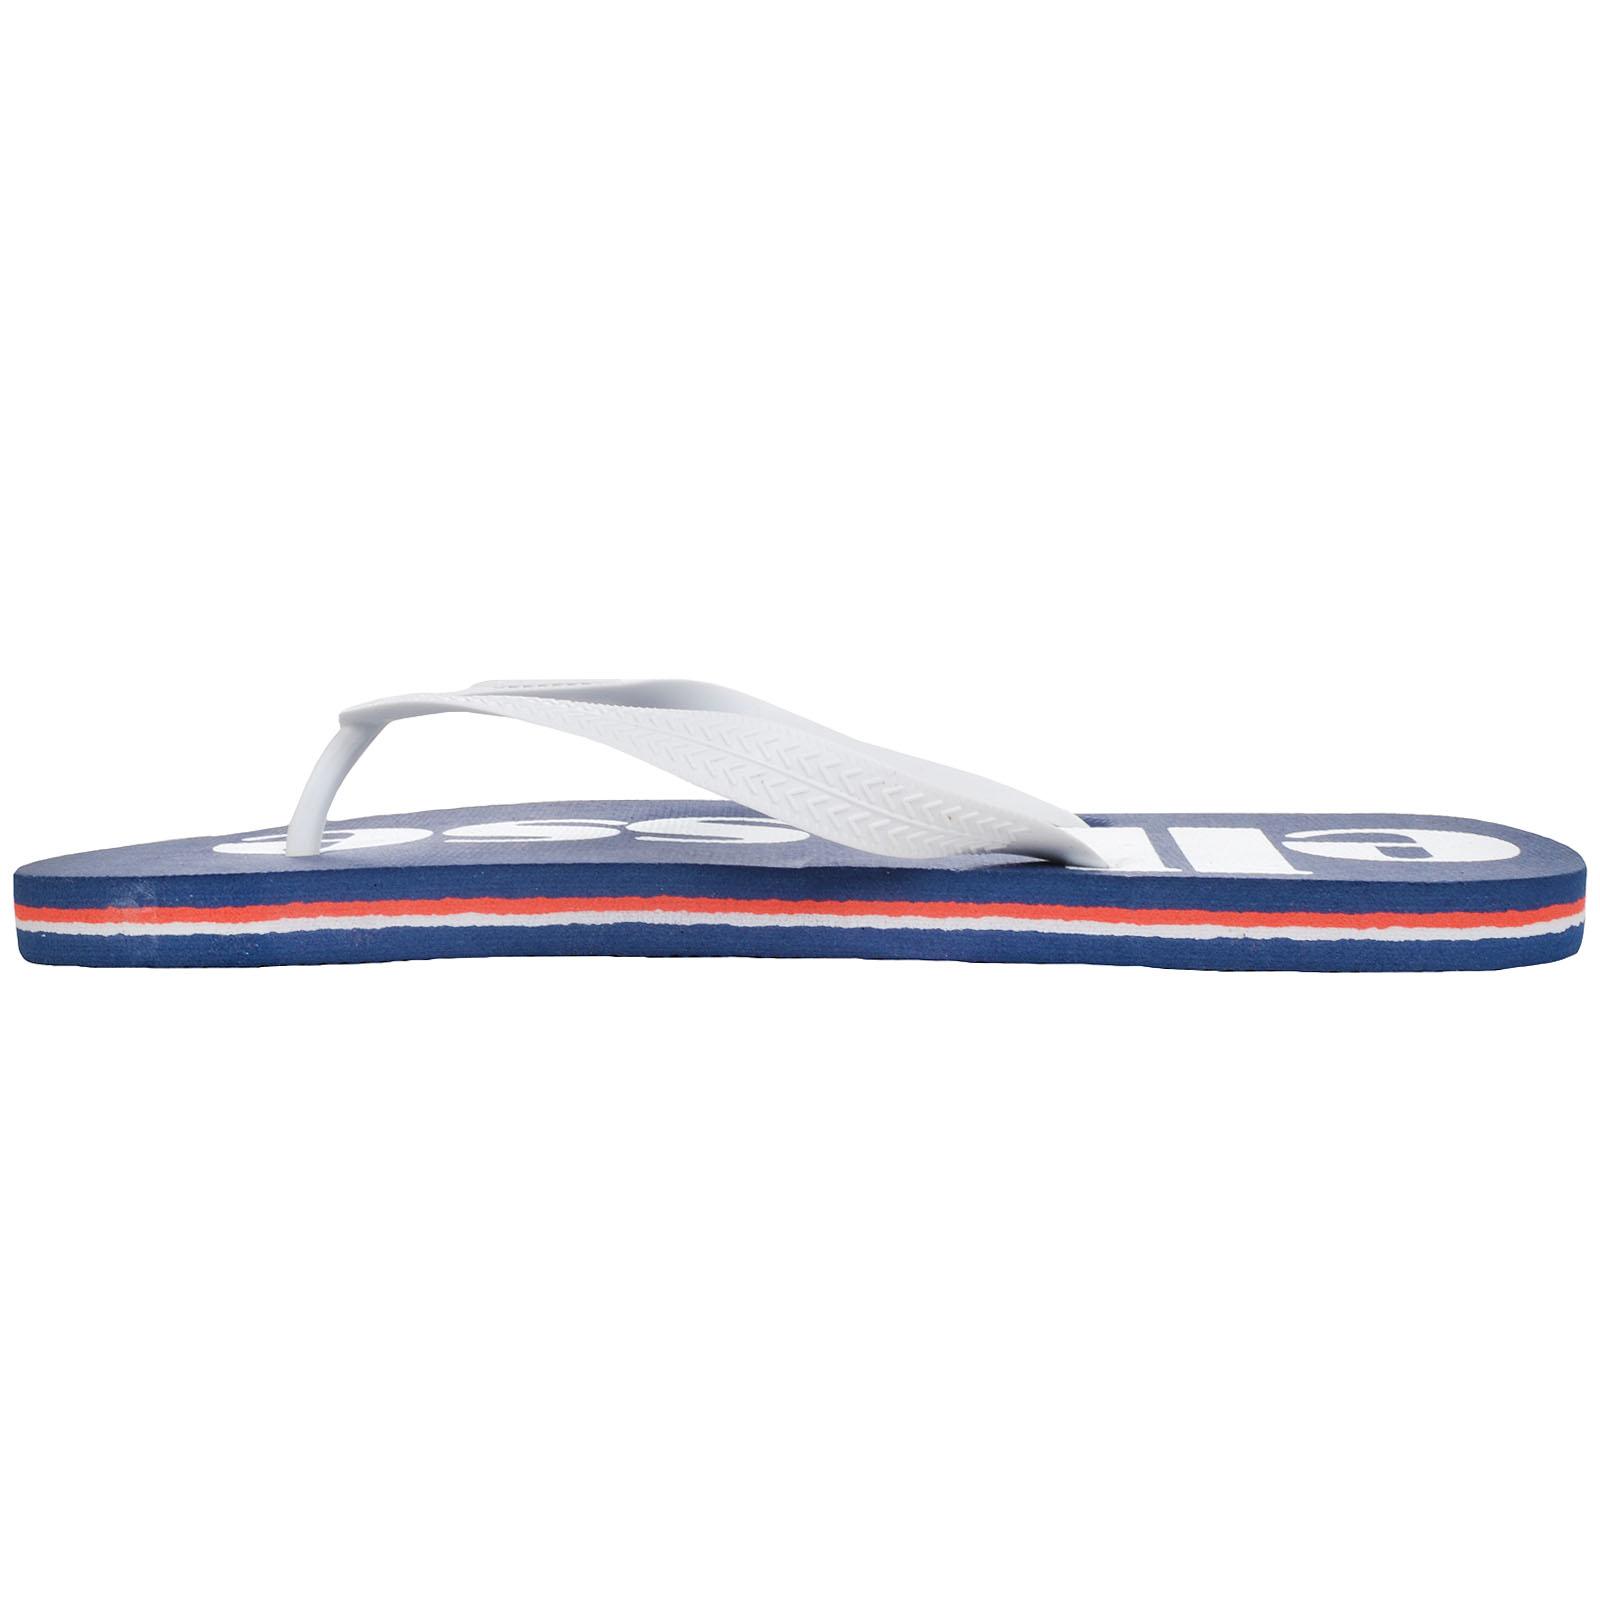 Ellesse-Mens-Marcos-Flip-Flops-Beach-Pool-Holiday-Slip-On-Sandals-Thongs thumbnail 16